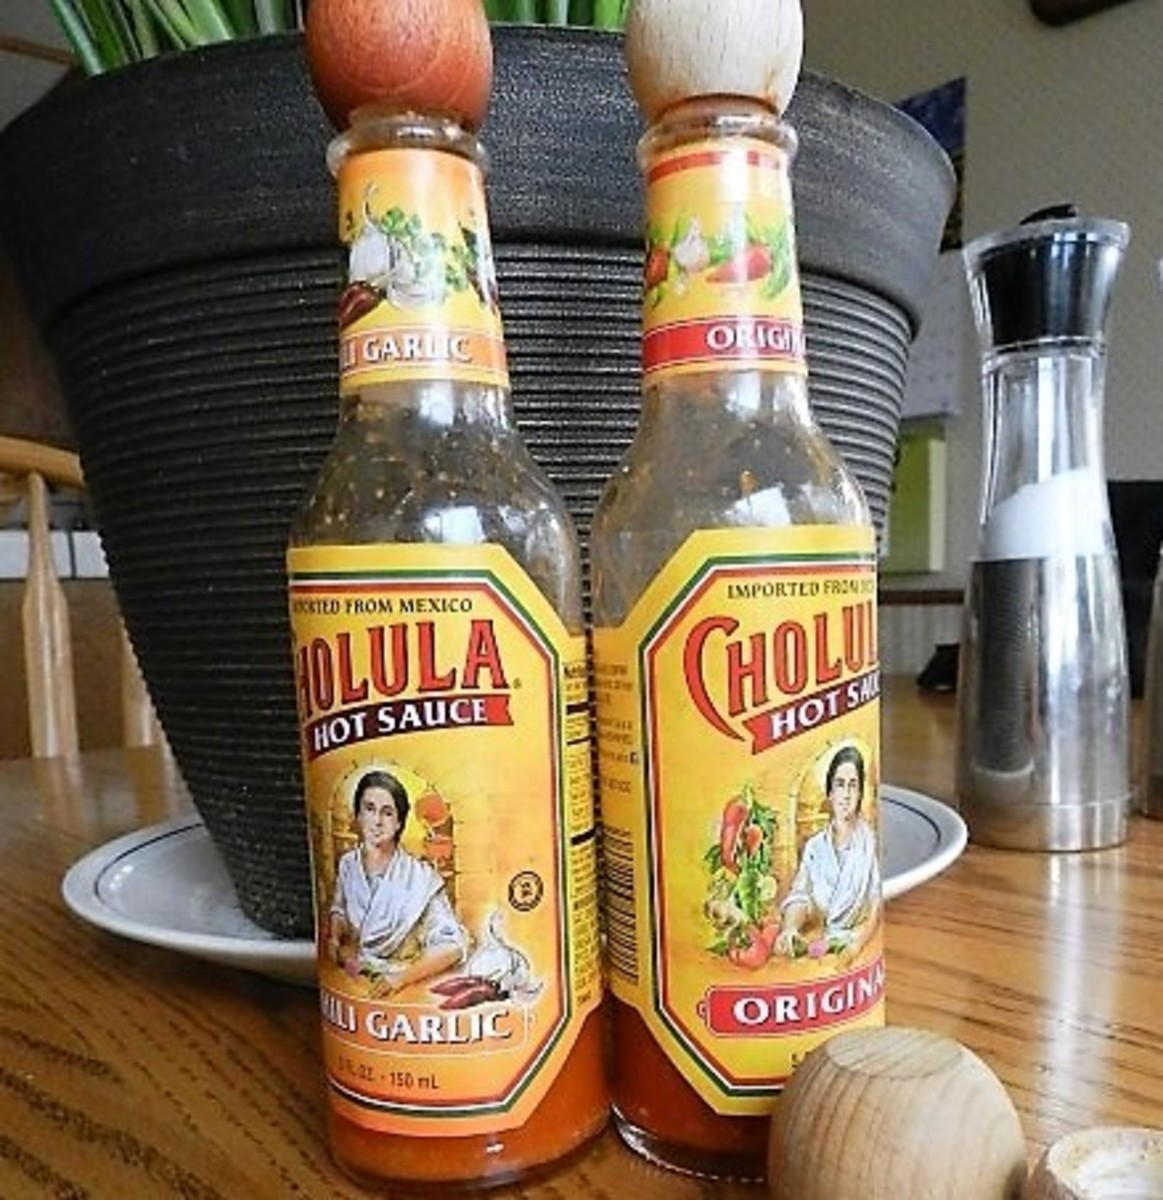 Cholula Hot Sauce and Its Wonderful Flavors